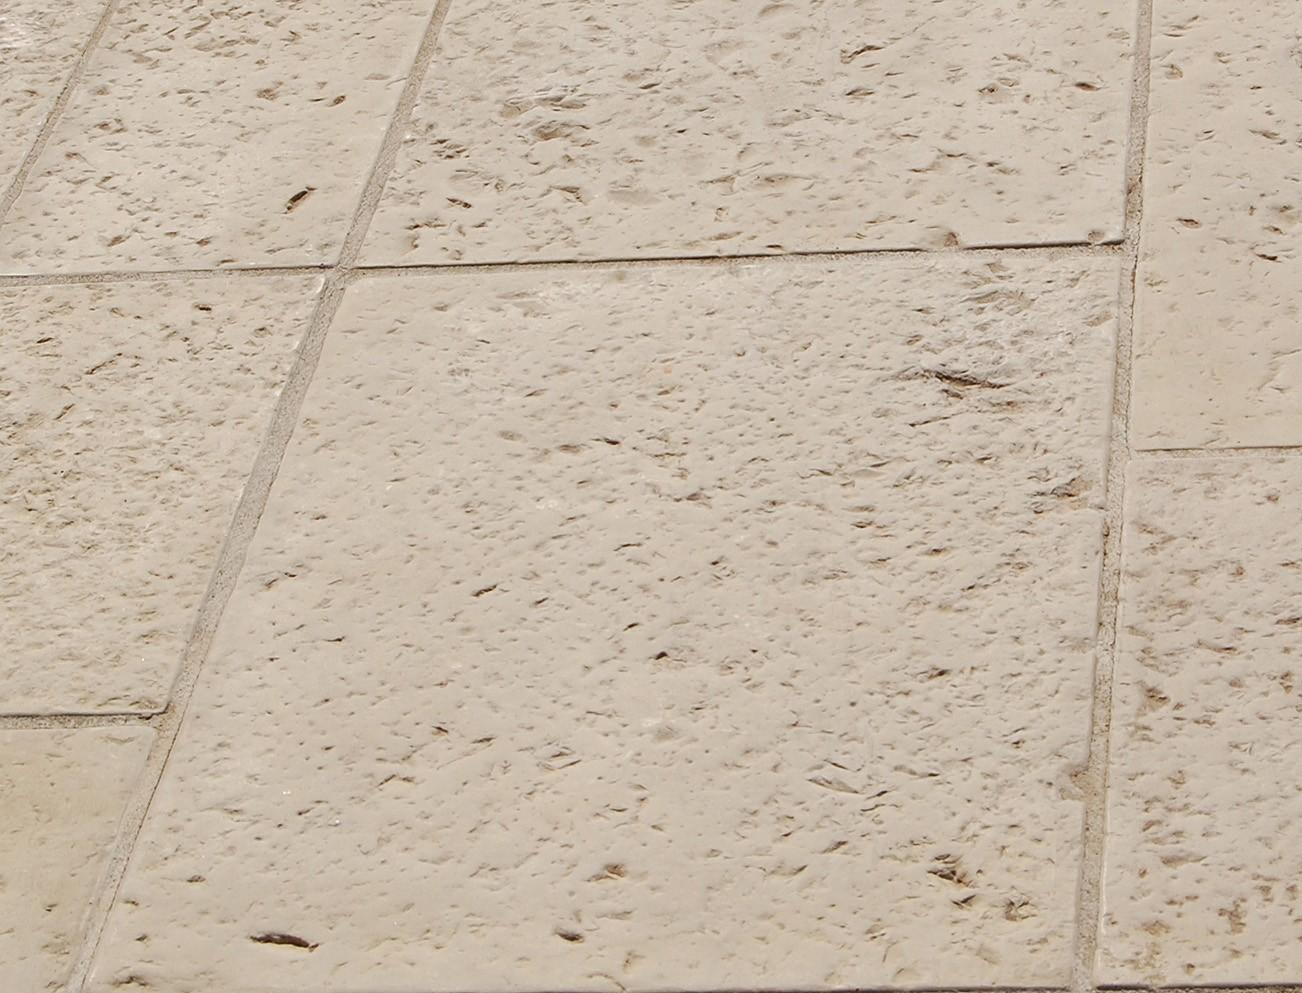 Dalle de terrasse en pierre reconstitu e 60 x 40 x 4 cm ocre - Dalle terrasse pierre reconstituee ...